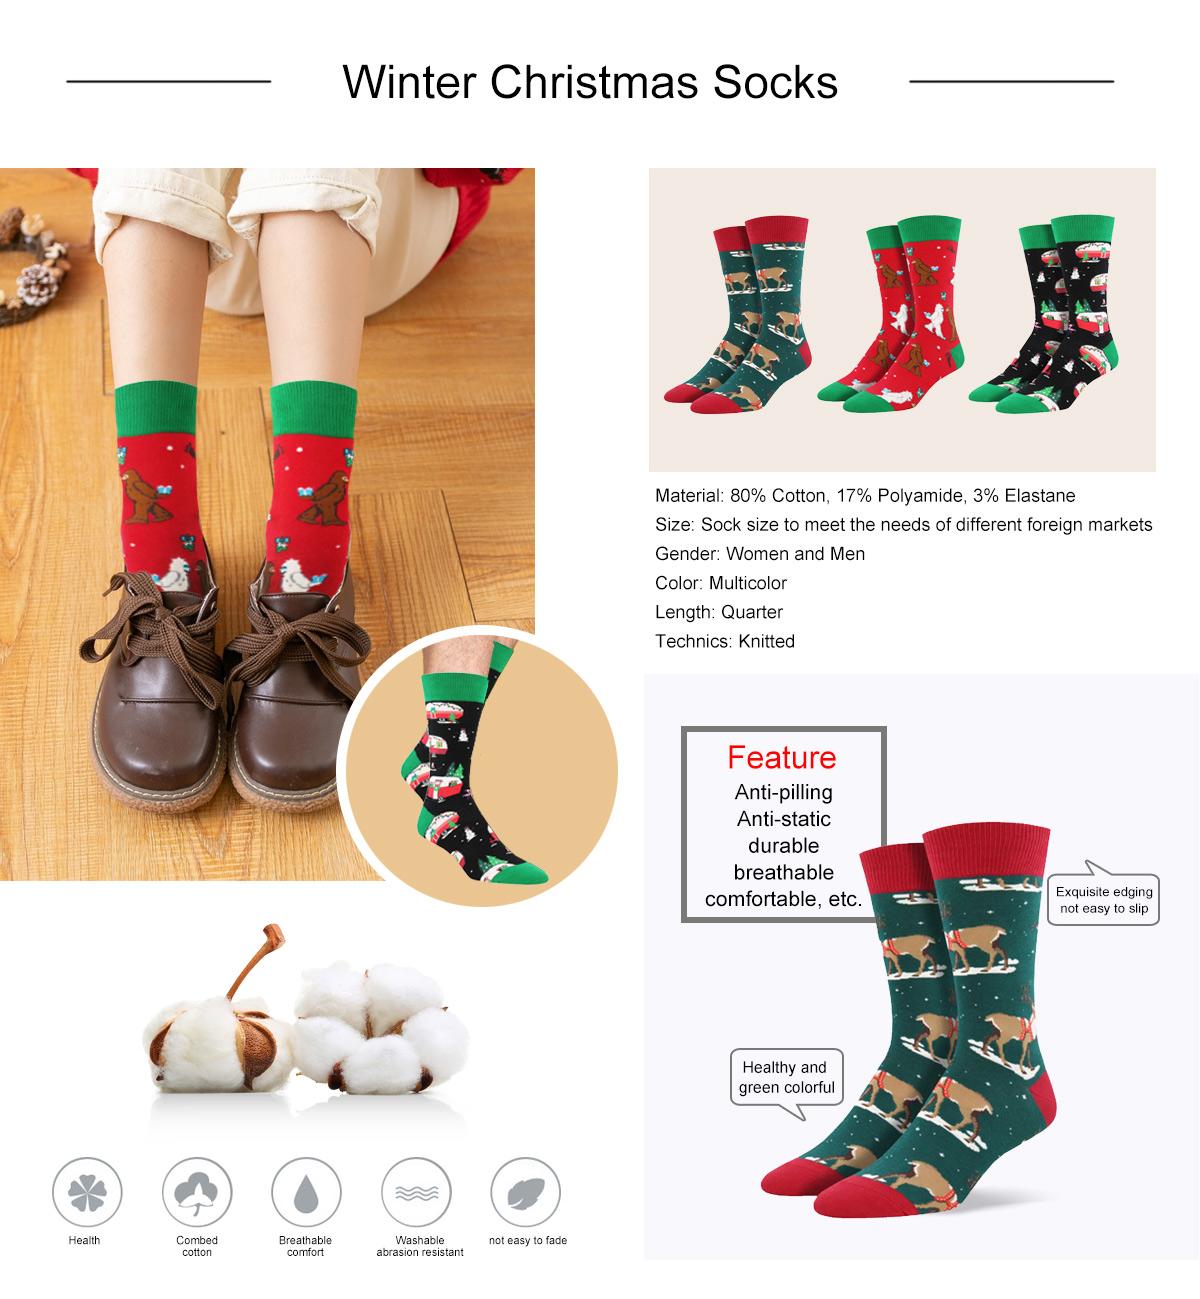 Winter Christmas Socks